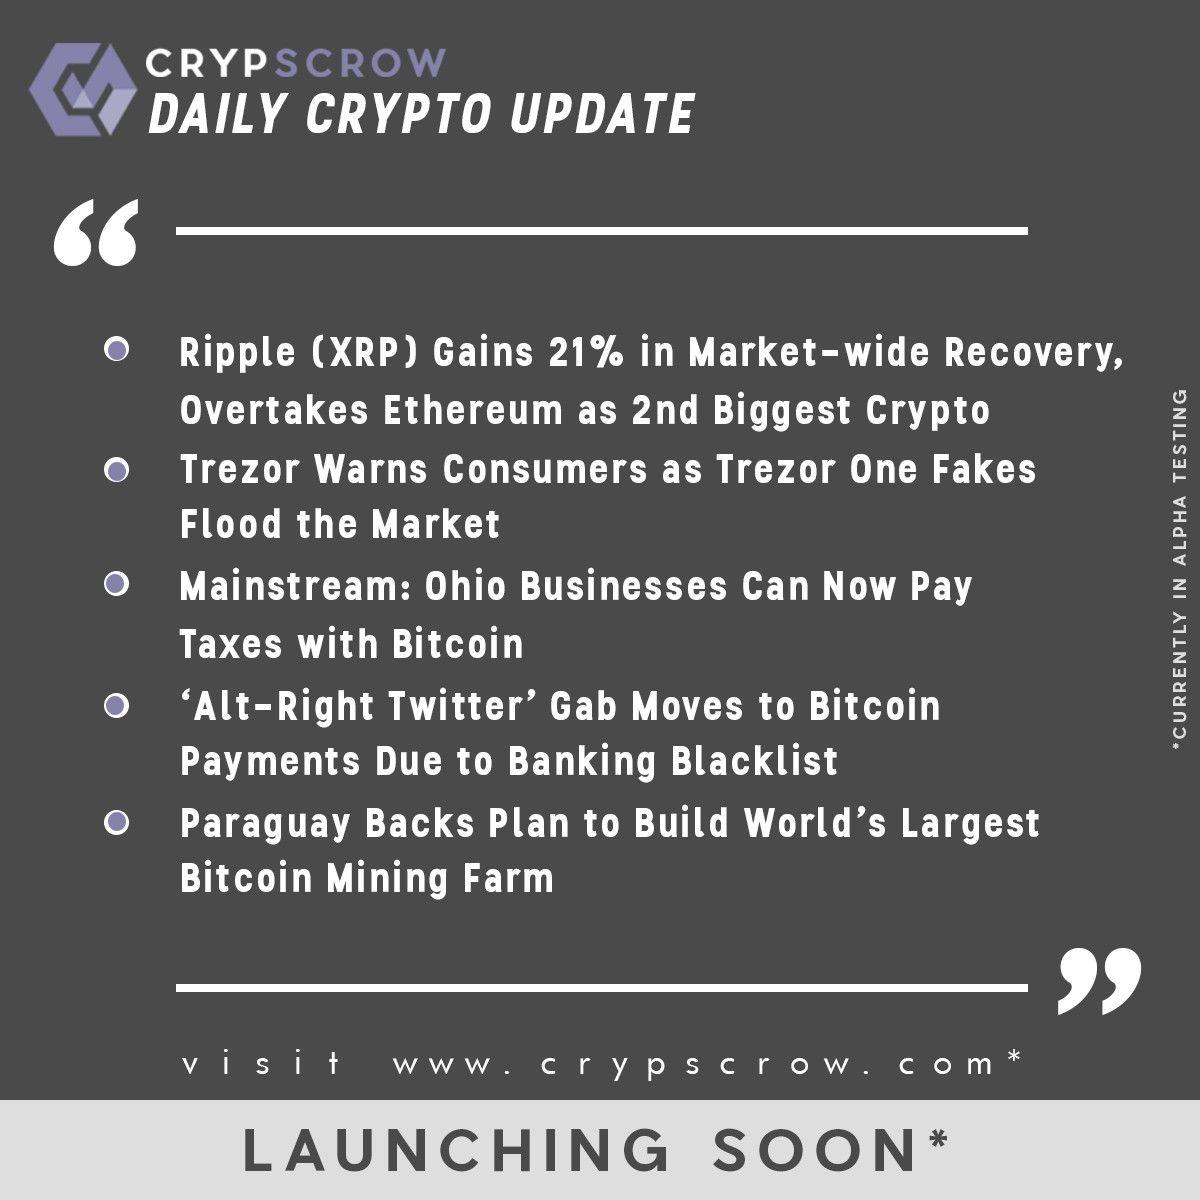 dailycryptoupdate #cryptonews #crypscrow #ripple #xrp